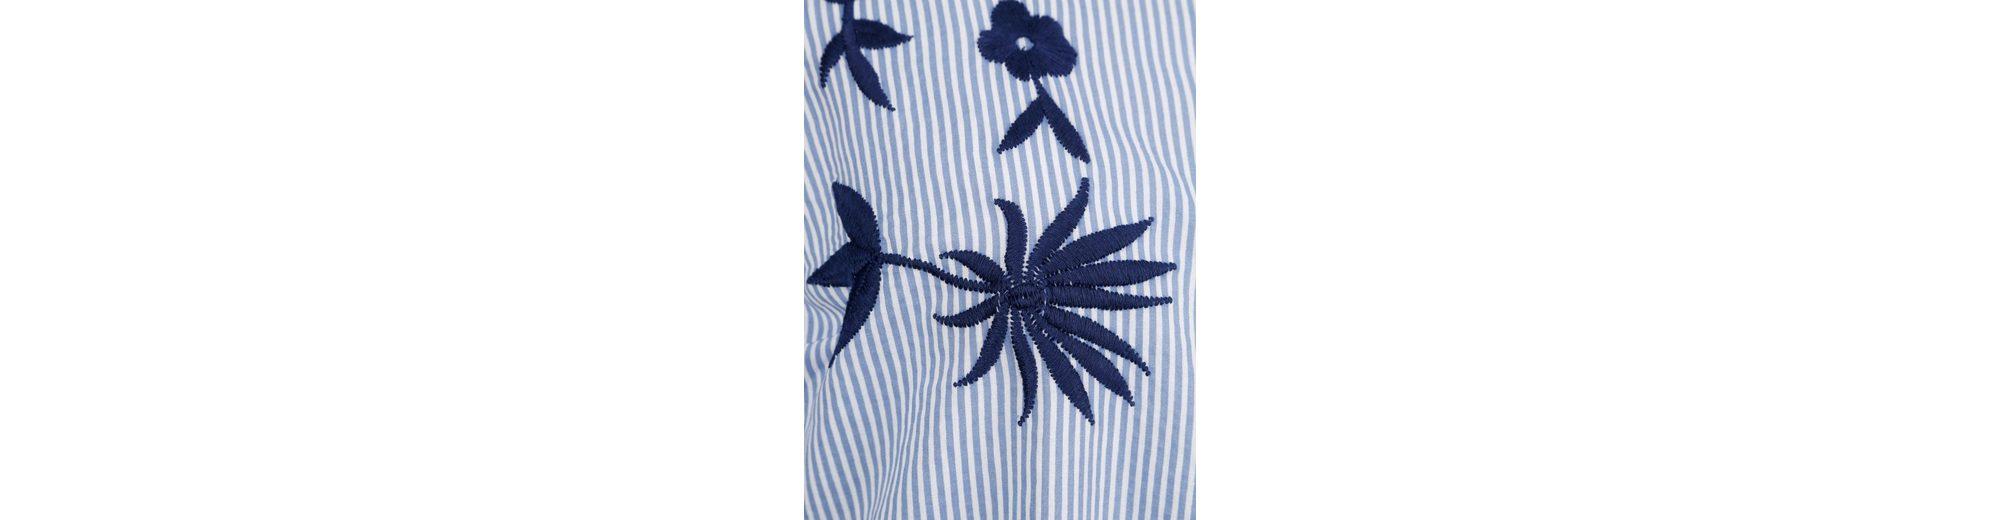 mit MIAMODA MIAMODA Longbluse Longbluse mit MIAMODA Stickereien MIAMODA Longbluse Stickereien mit Longbluse Stickereien mit MIAMODA Stickereien qx7nf7tU